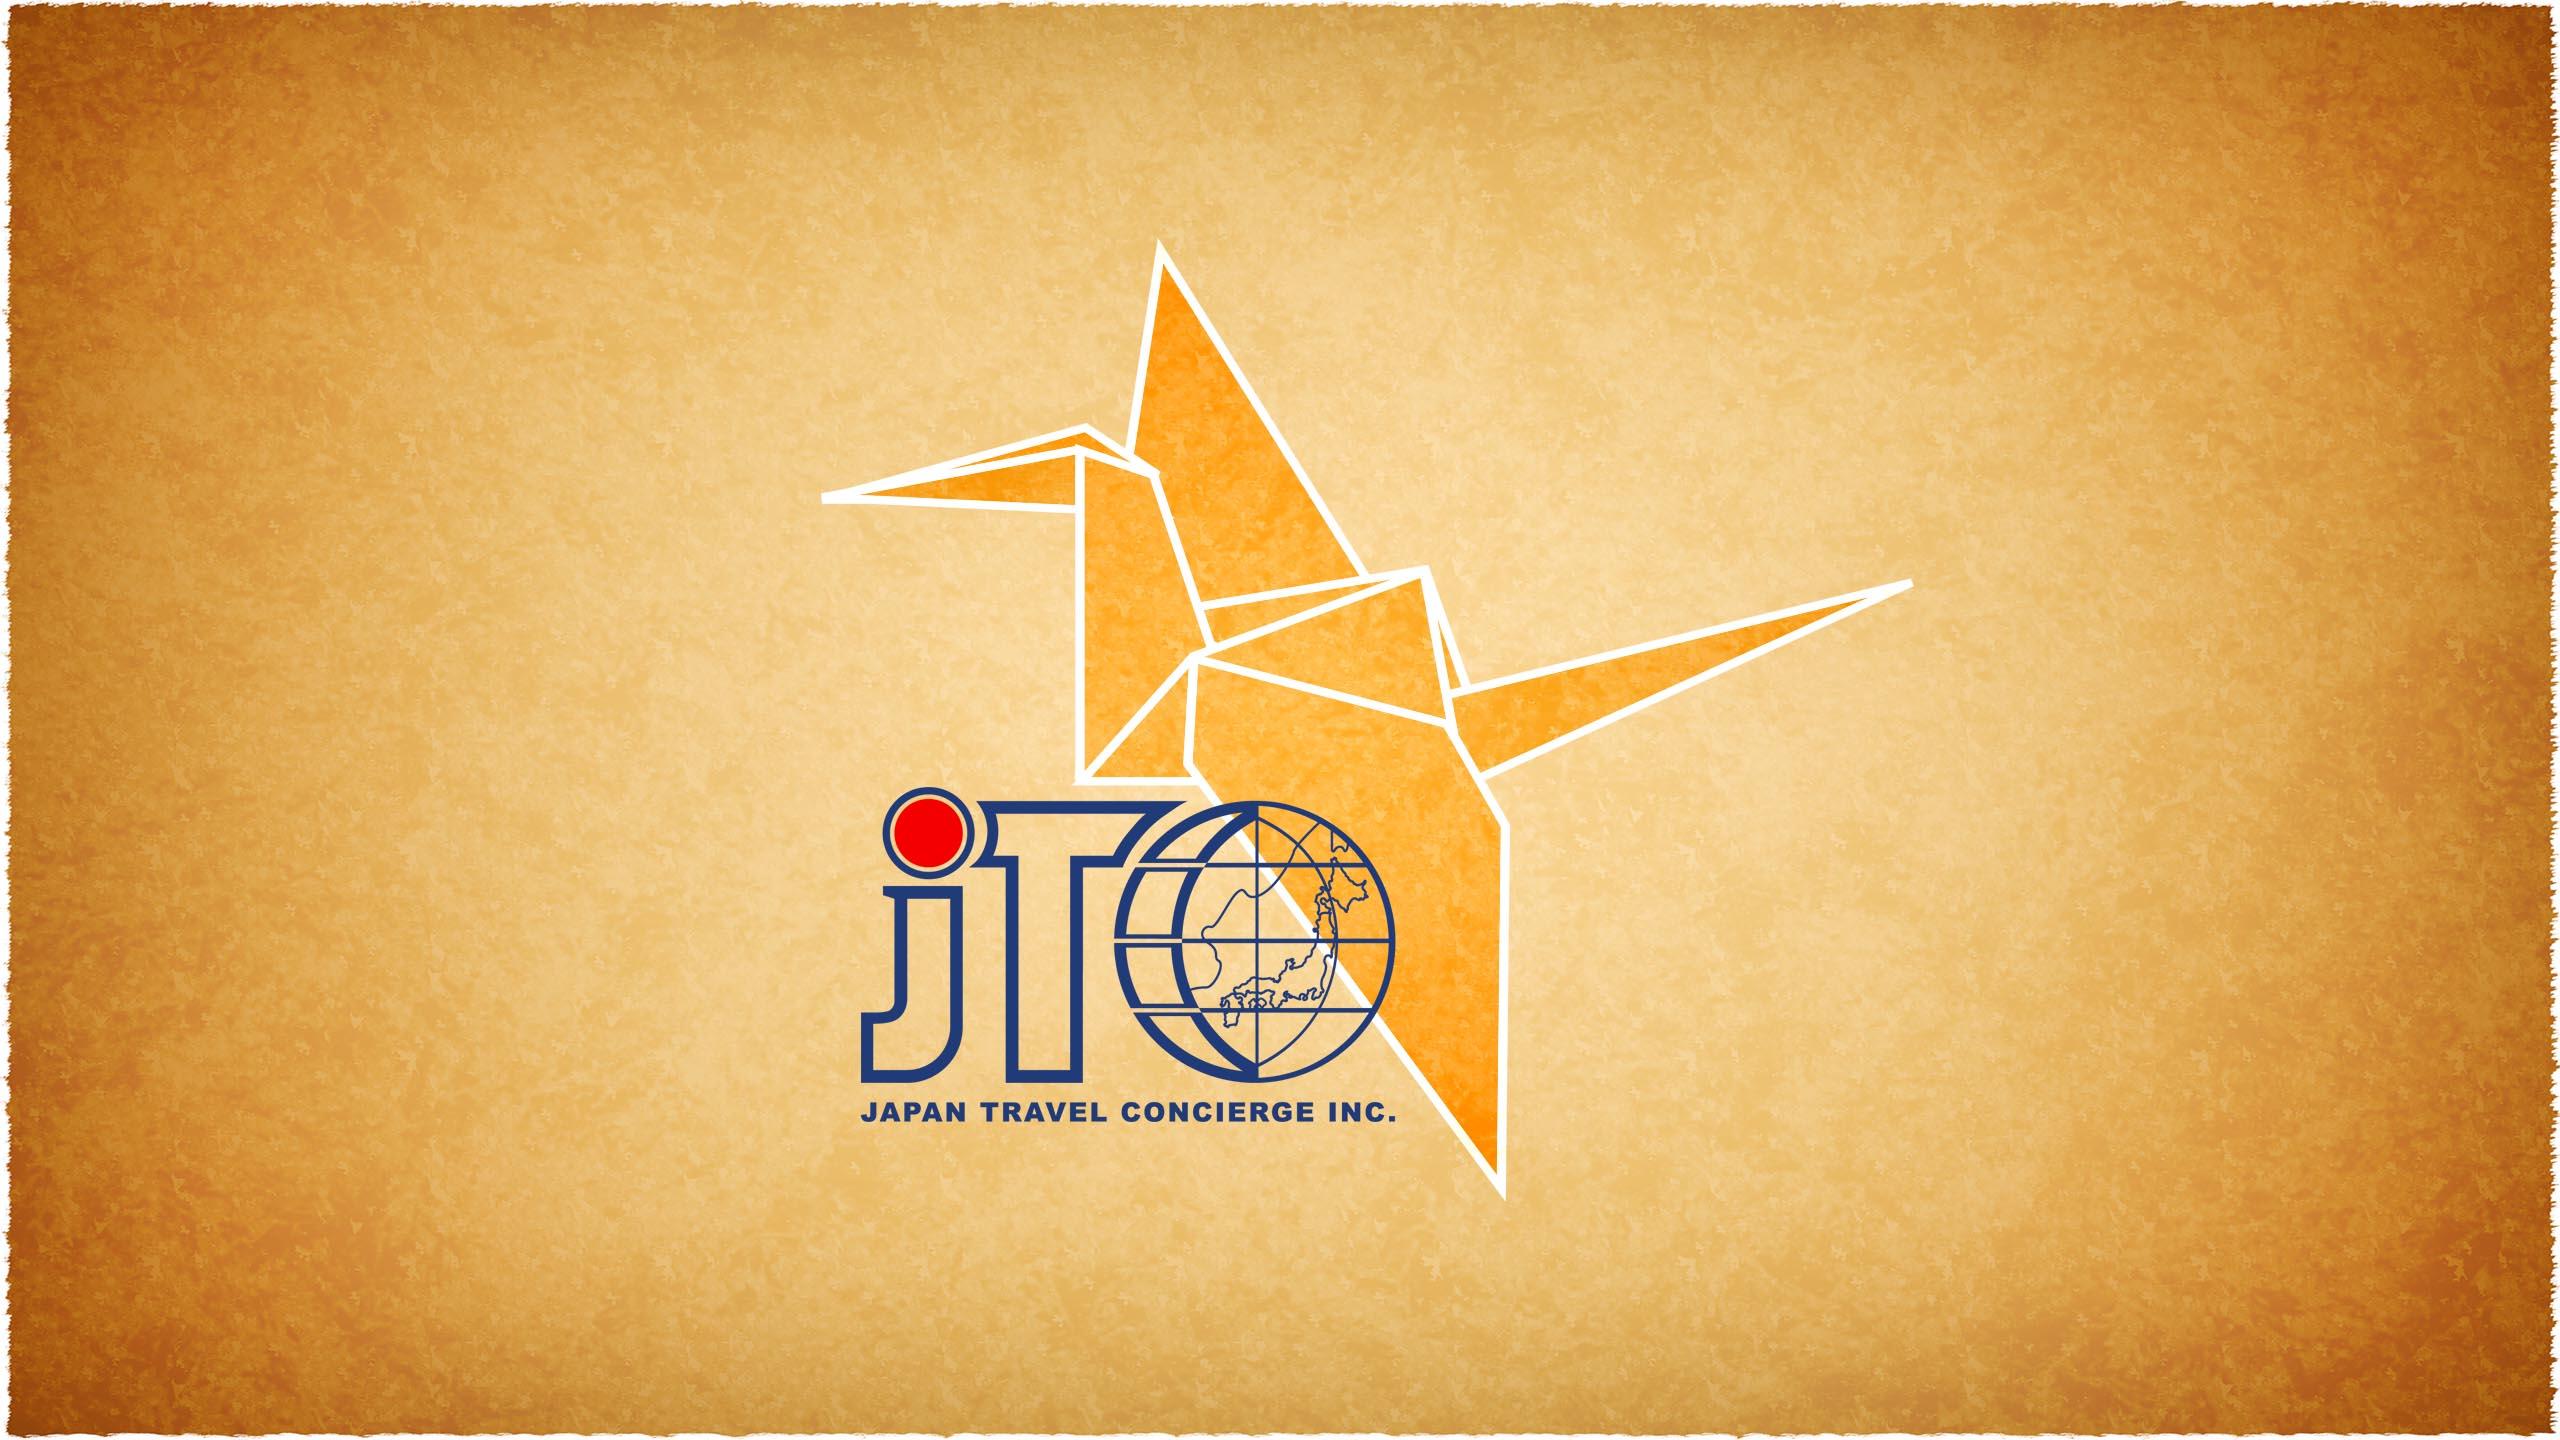 Обложки в соц. сети для тур. оператора по Японии фото f_02259b968fd11591.jpg